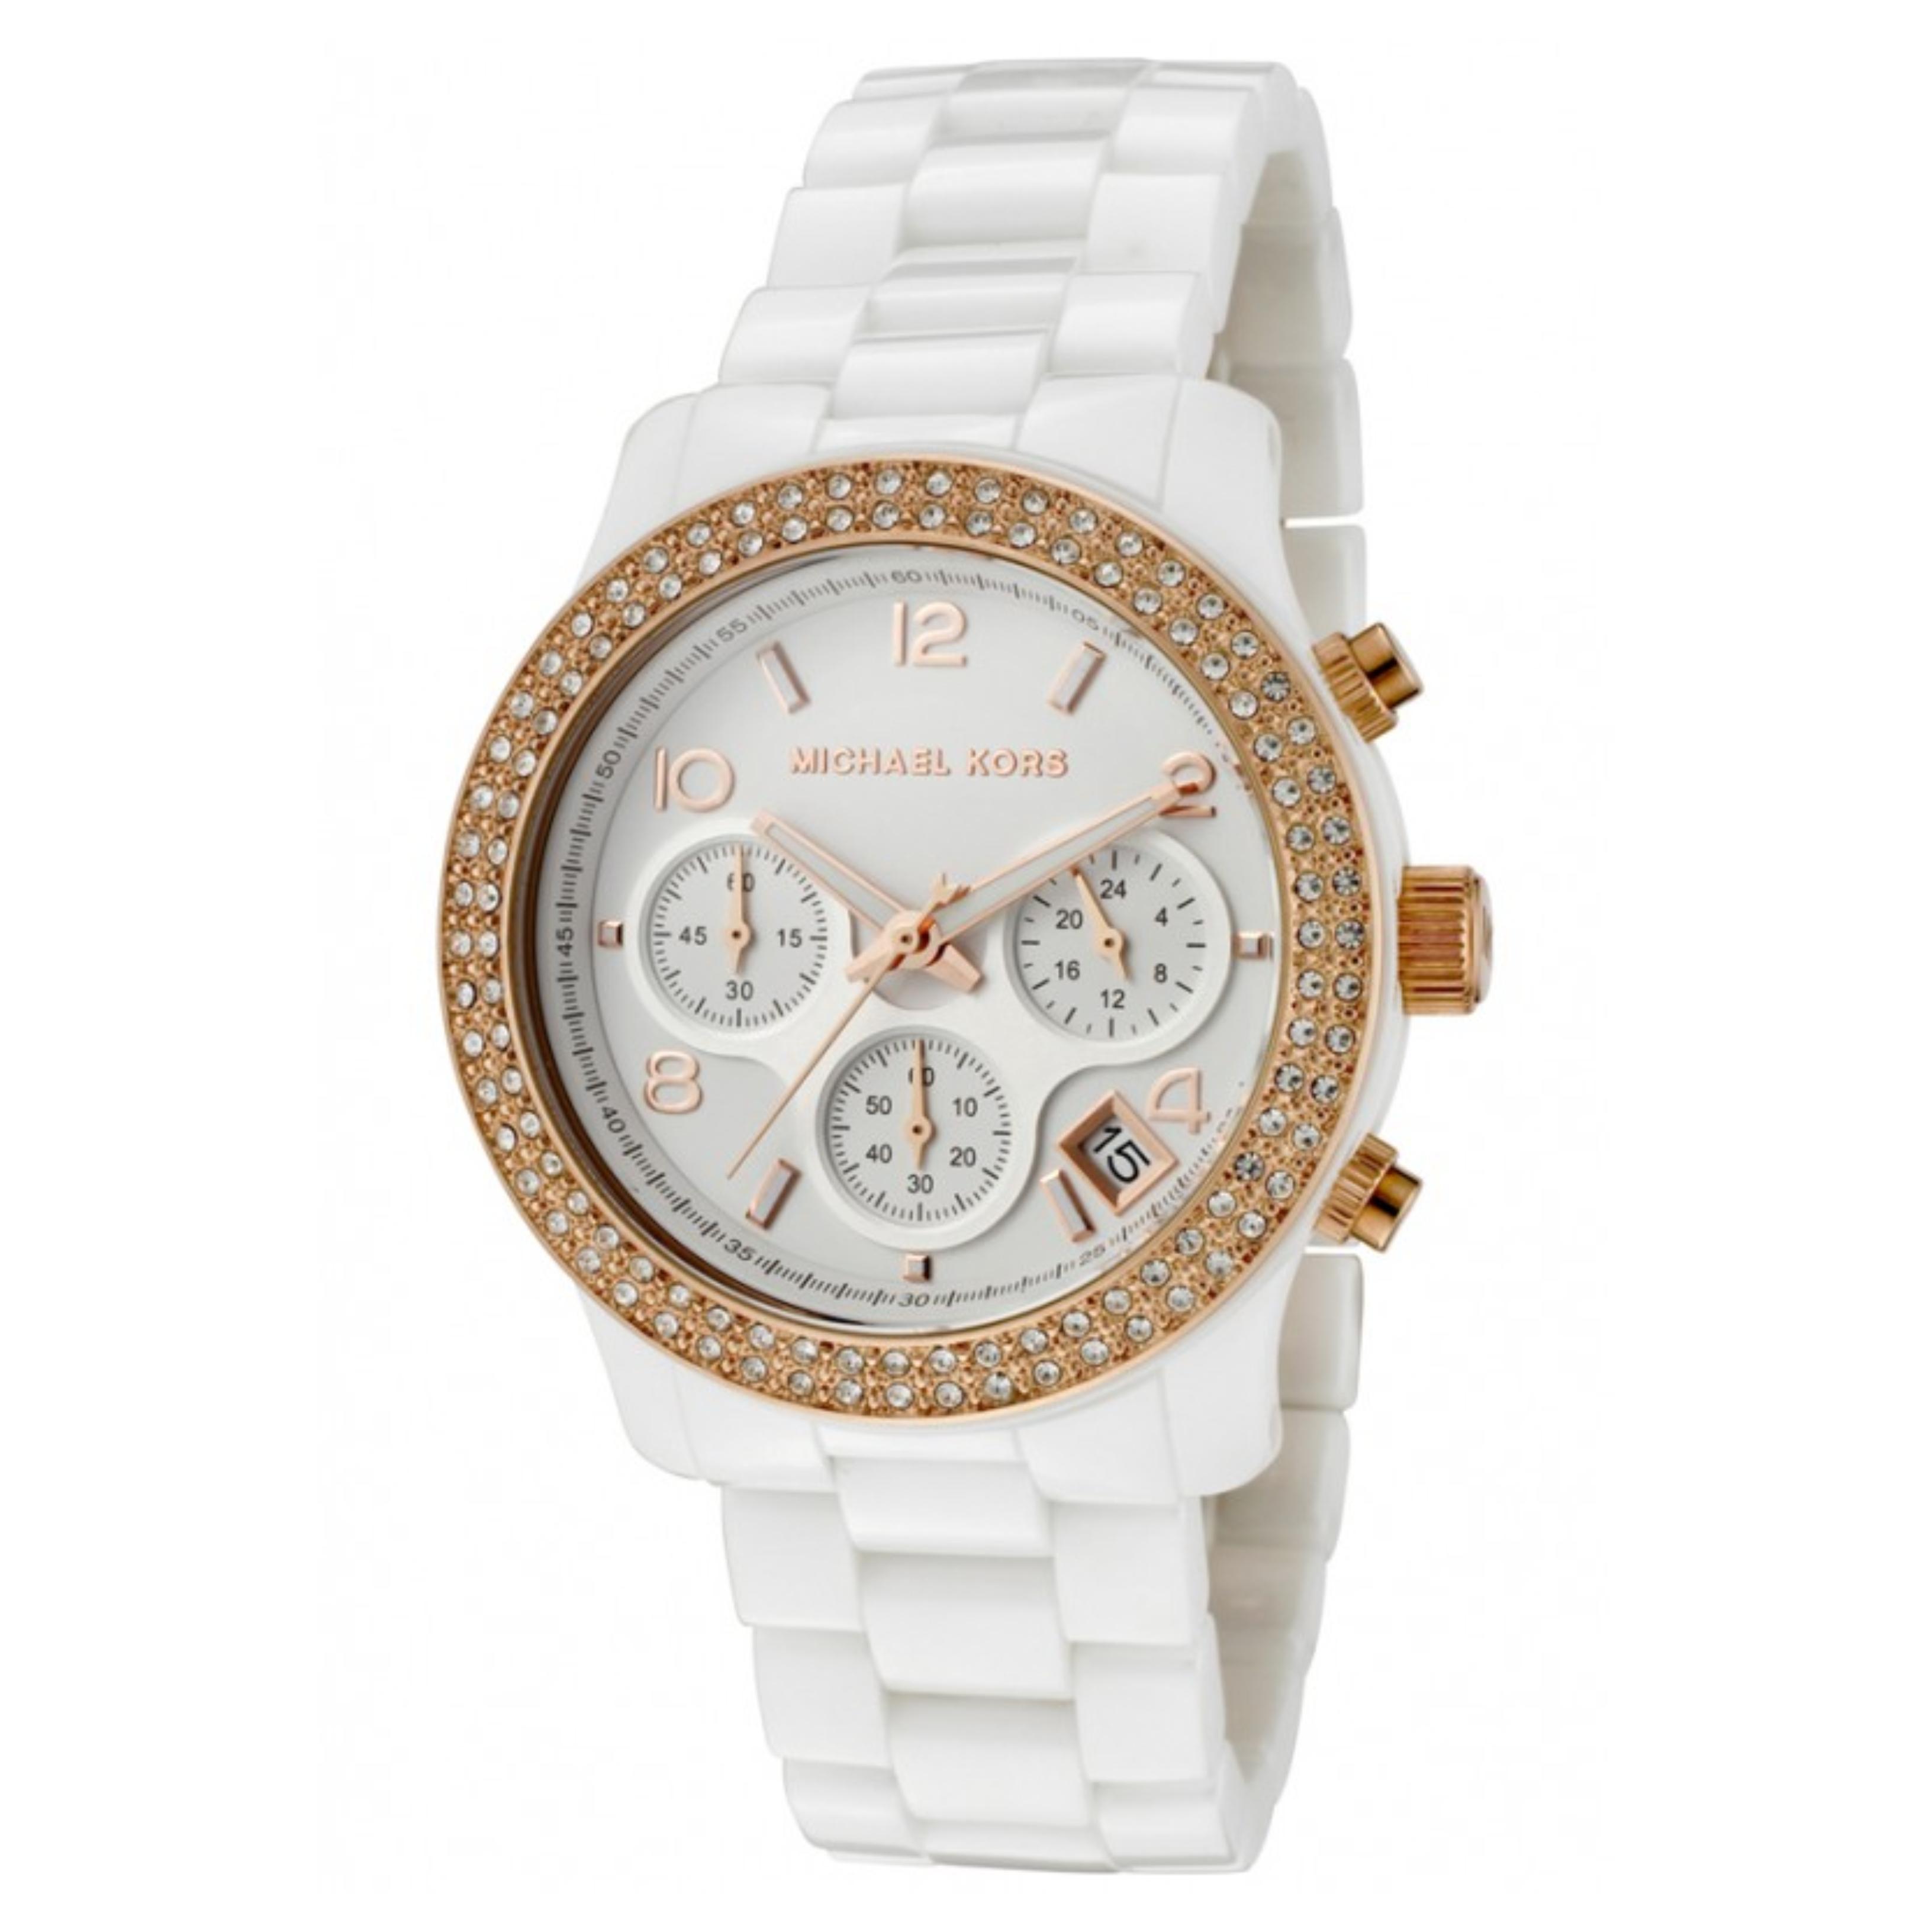 Michael Kors Ladies Watch|Swarovski Crystals Dial|White Ceramic Bracelet|MK5269